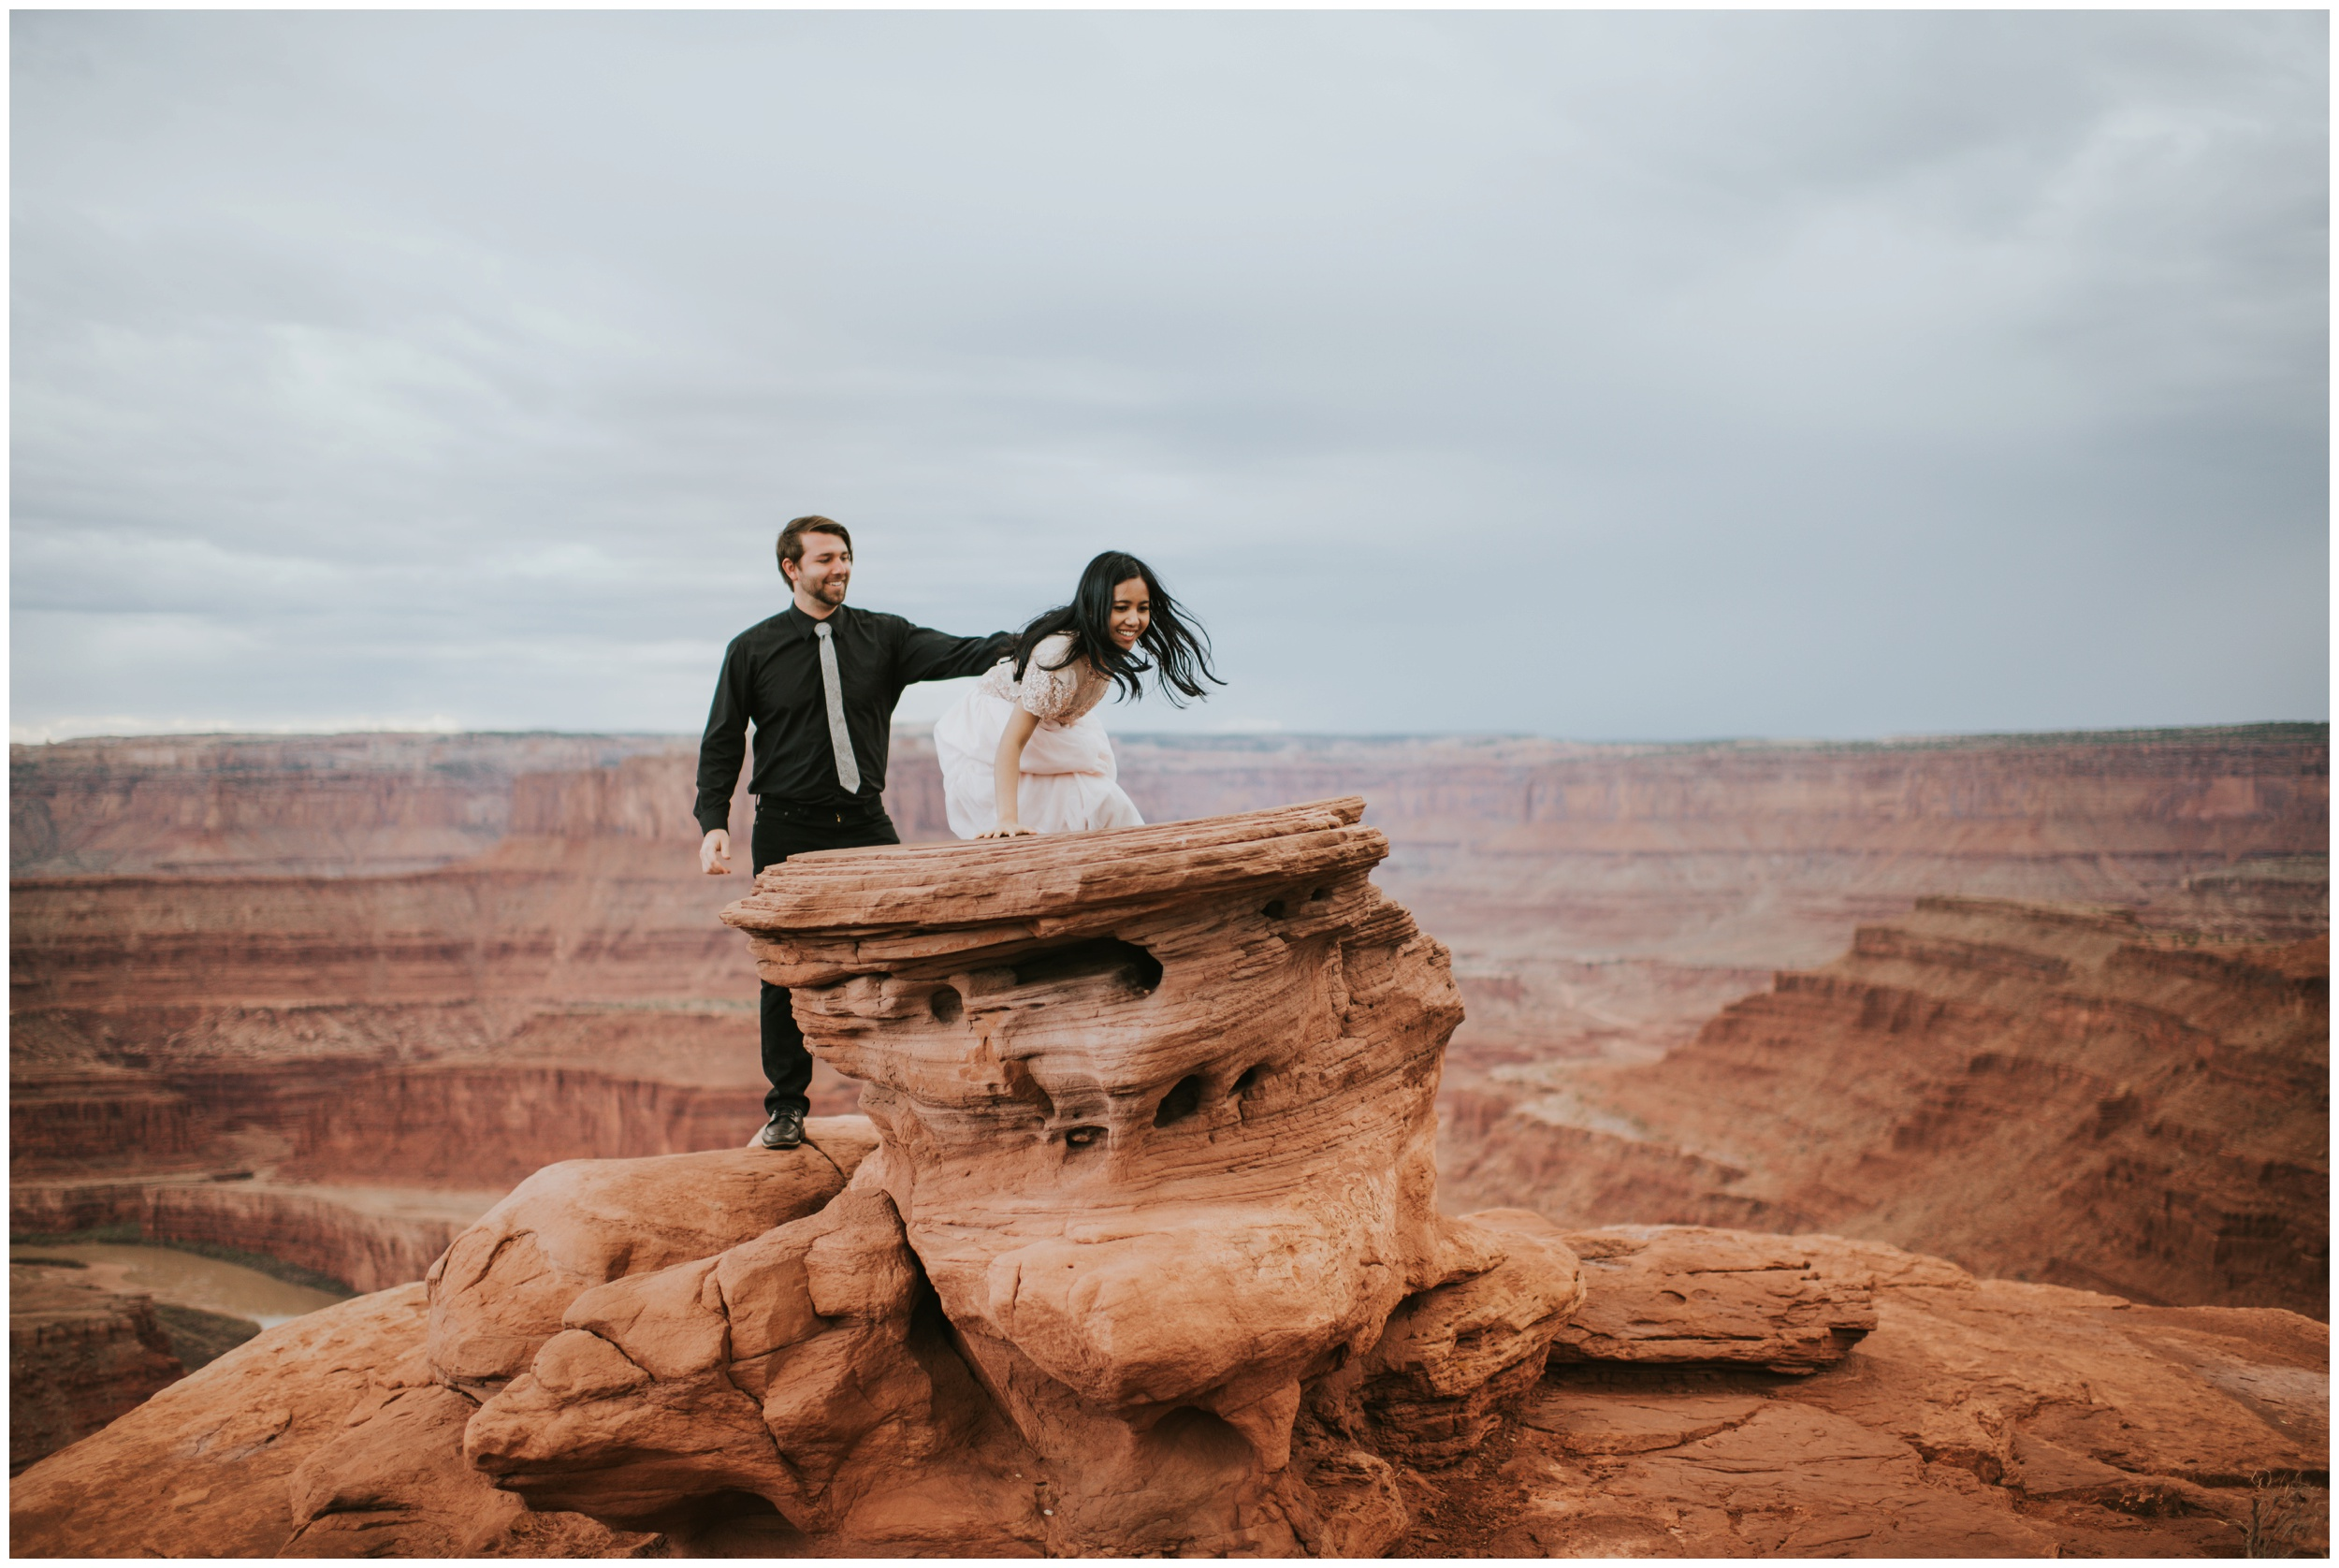 Couple climbing rocks at dead horse point in Moab utah | Elopement Photographer www.riversandroadsphotography.com